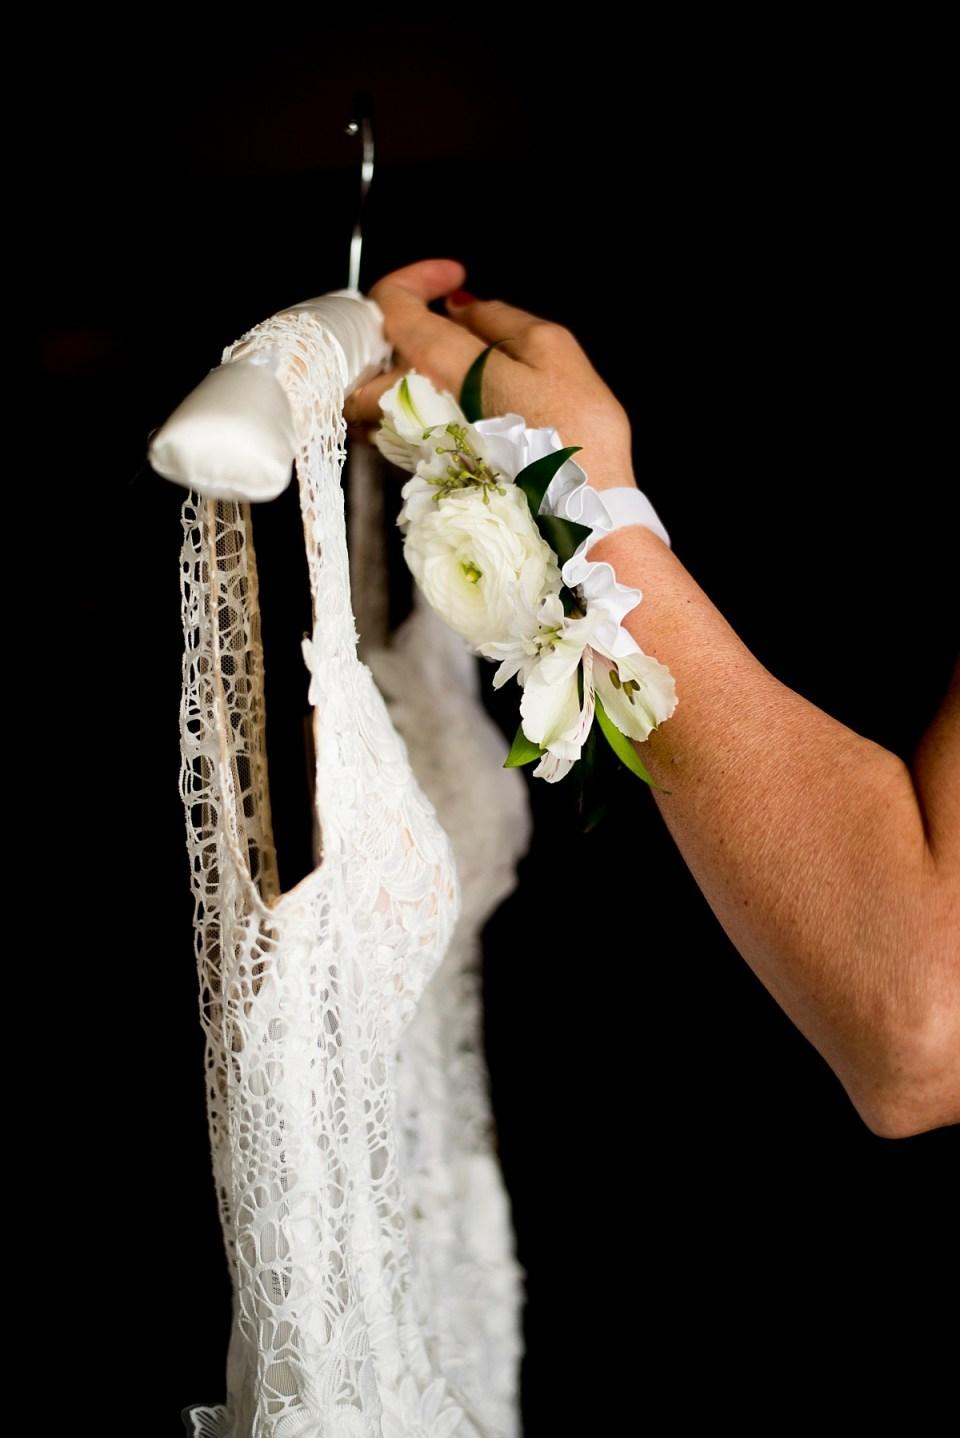 Bride Getting Ready in Bridal Suite, Falls Church, VA